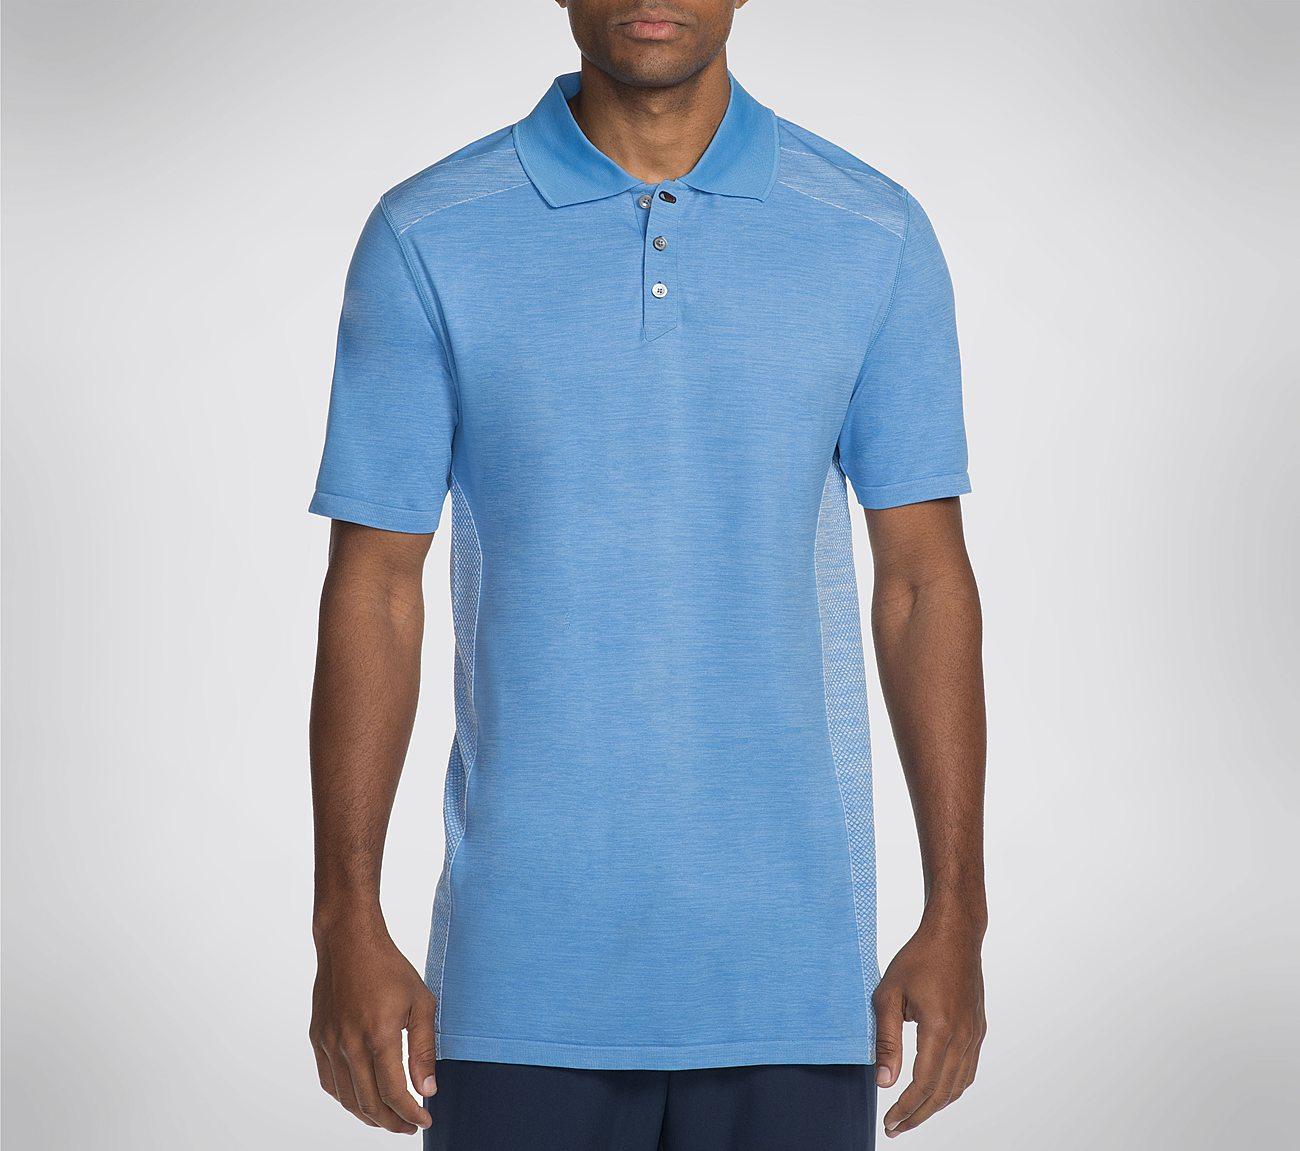 Men's Skechers GO GOLF Knit Seamless Polo Shirt